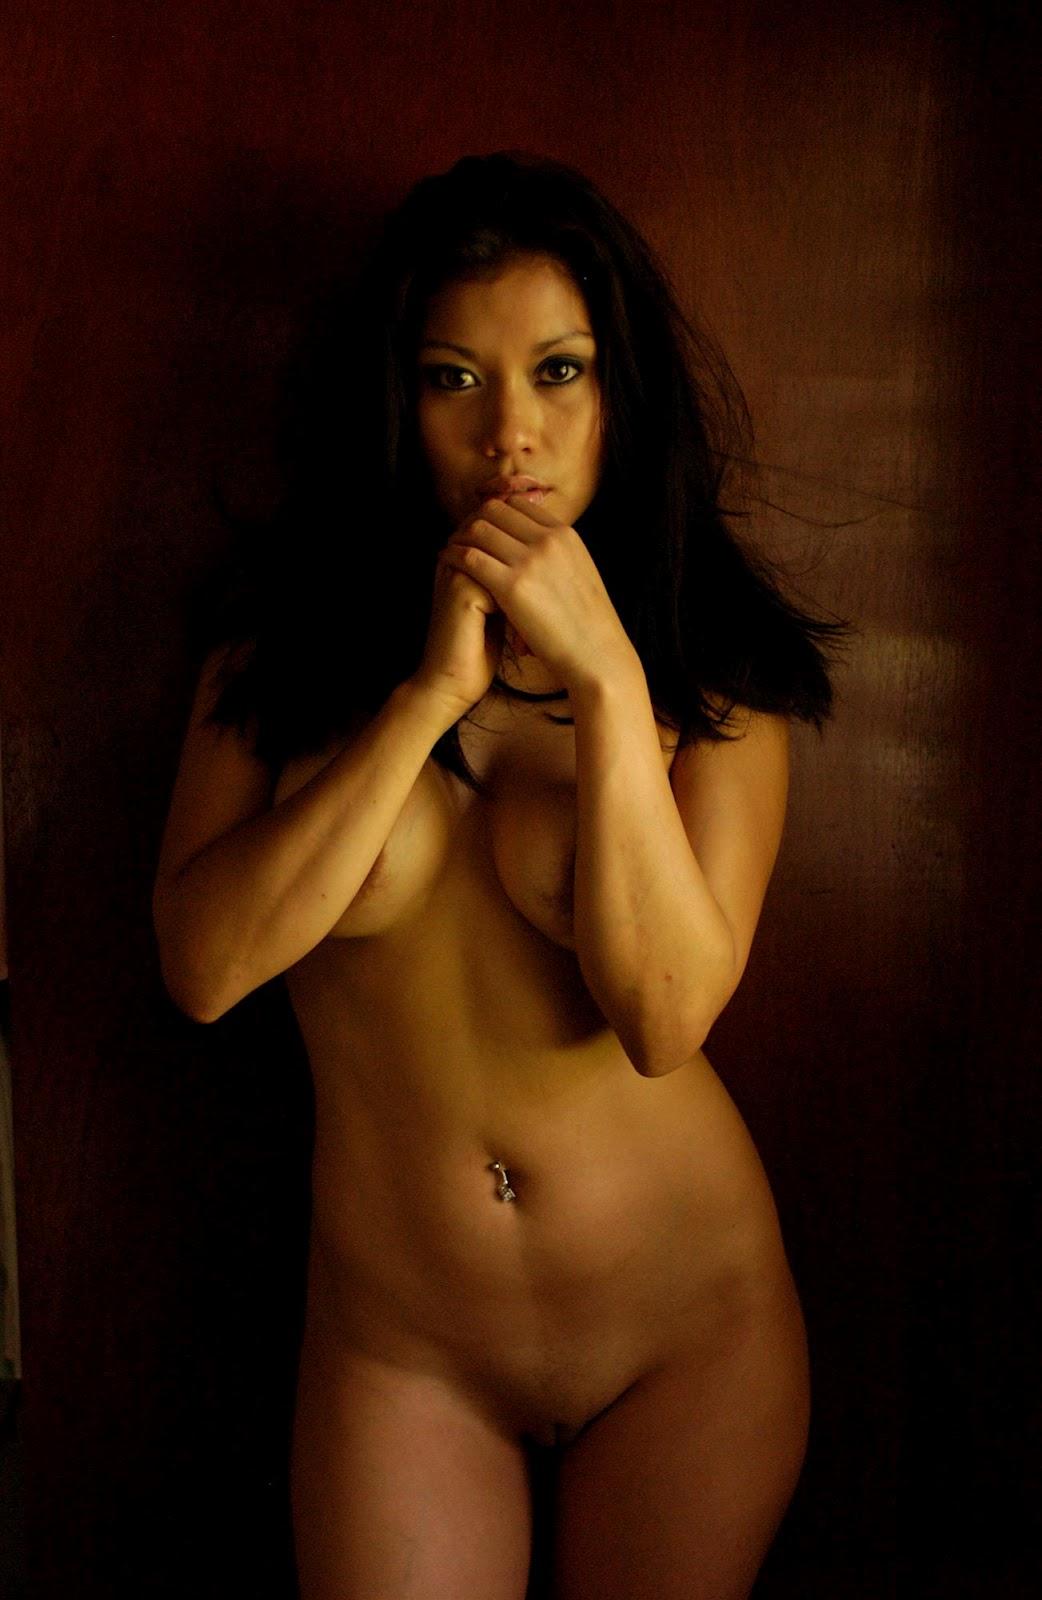 Porn naked hot picshar woman pussy natural